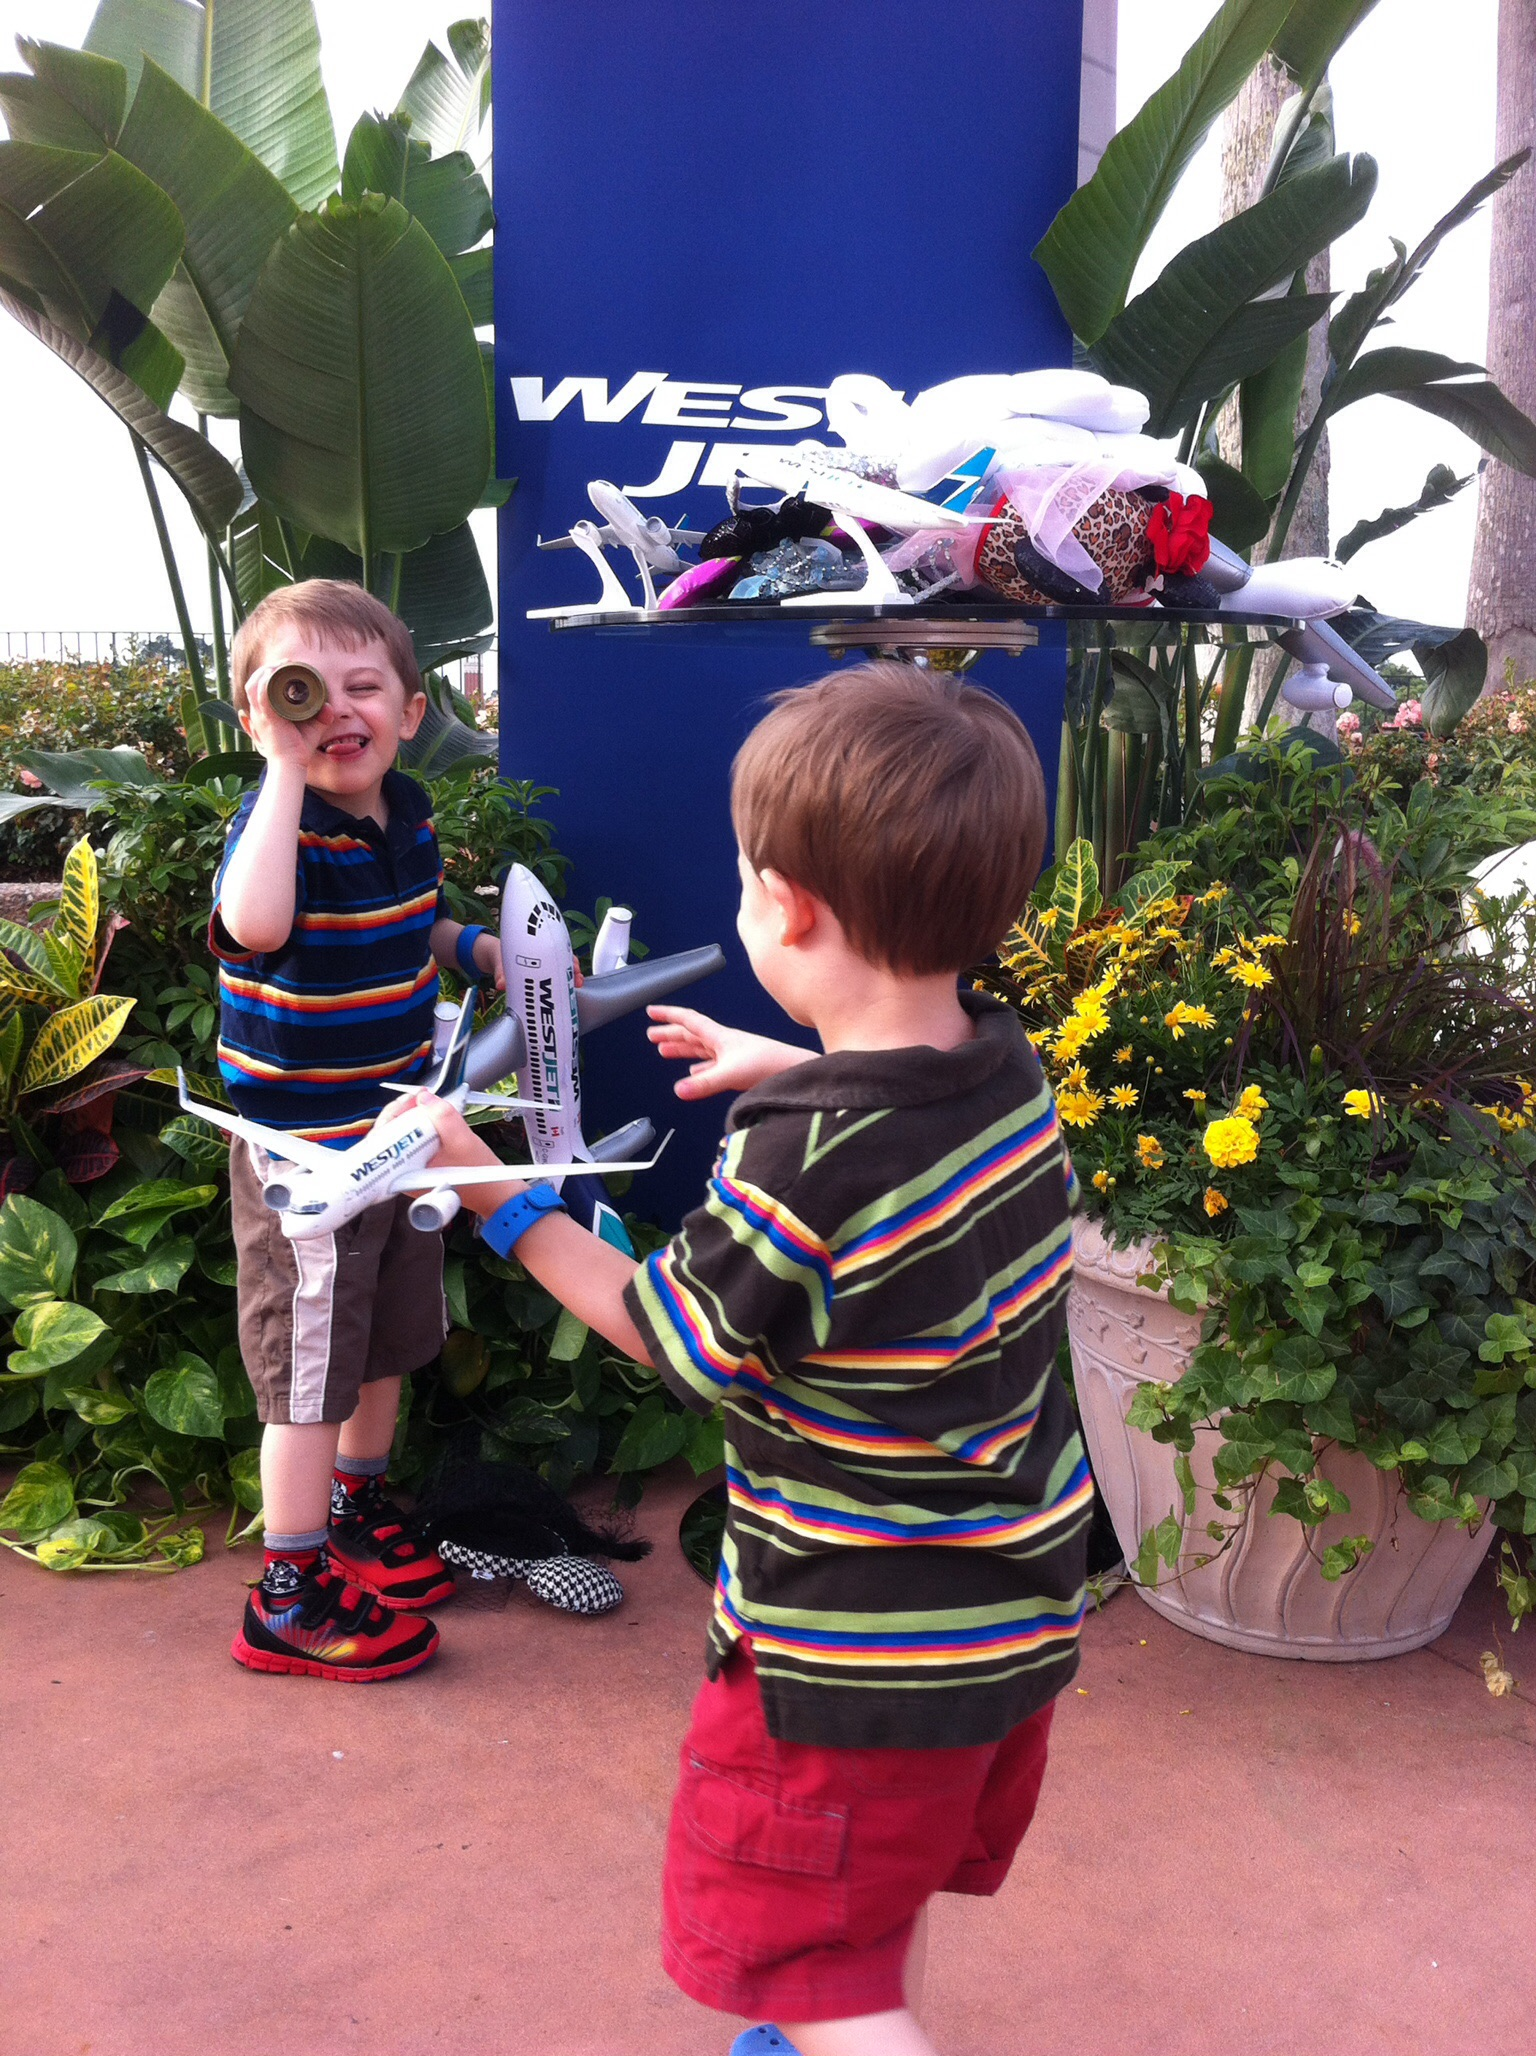 Image Westjet Festival Contest